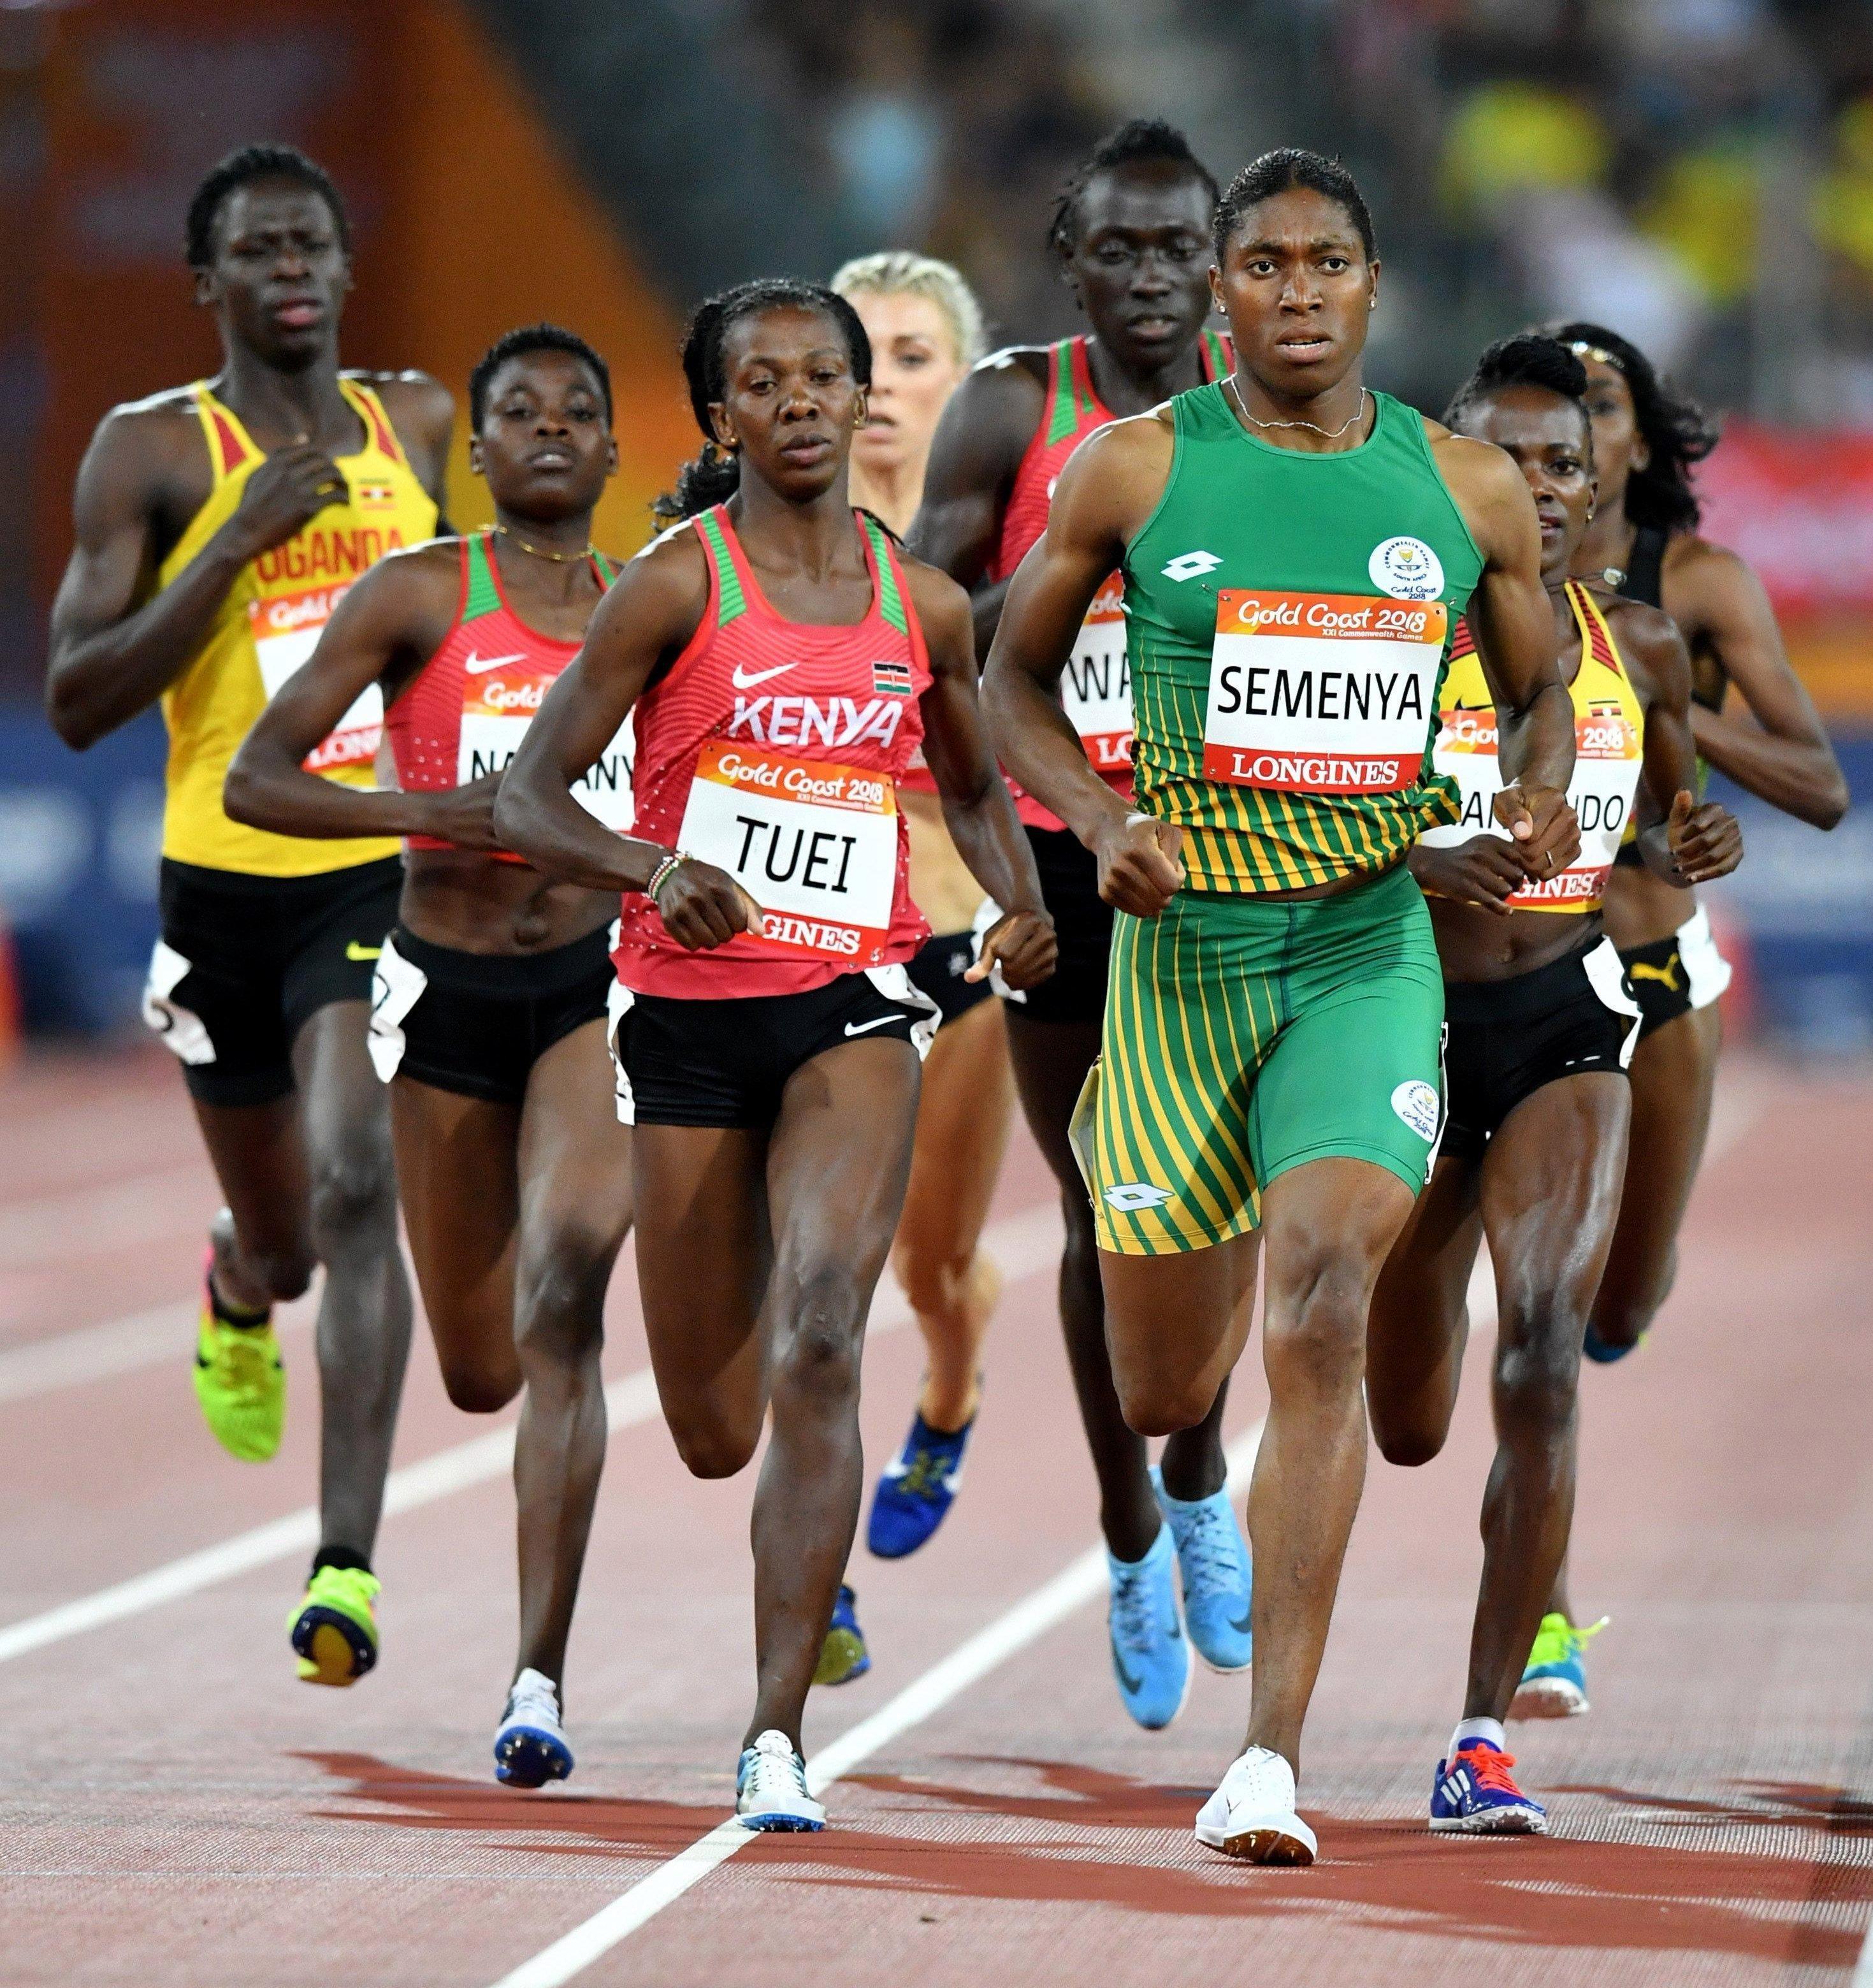 Semenya often looks far bigger than her rivals when she arrives at races